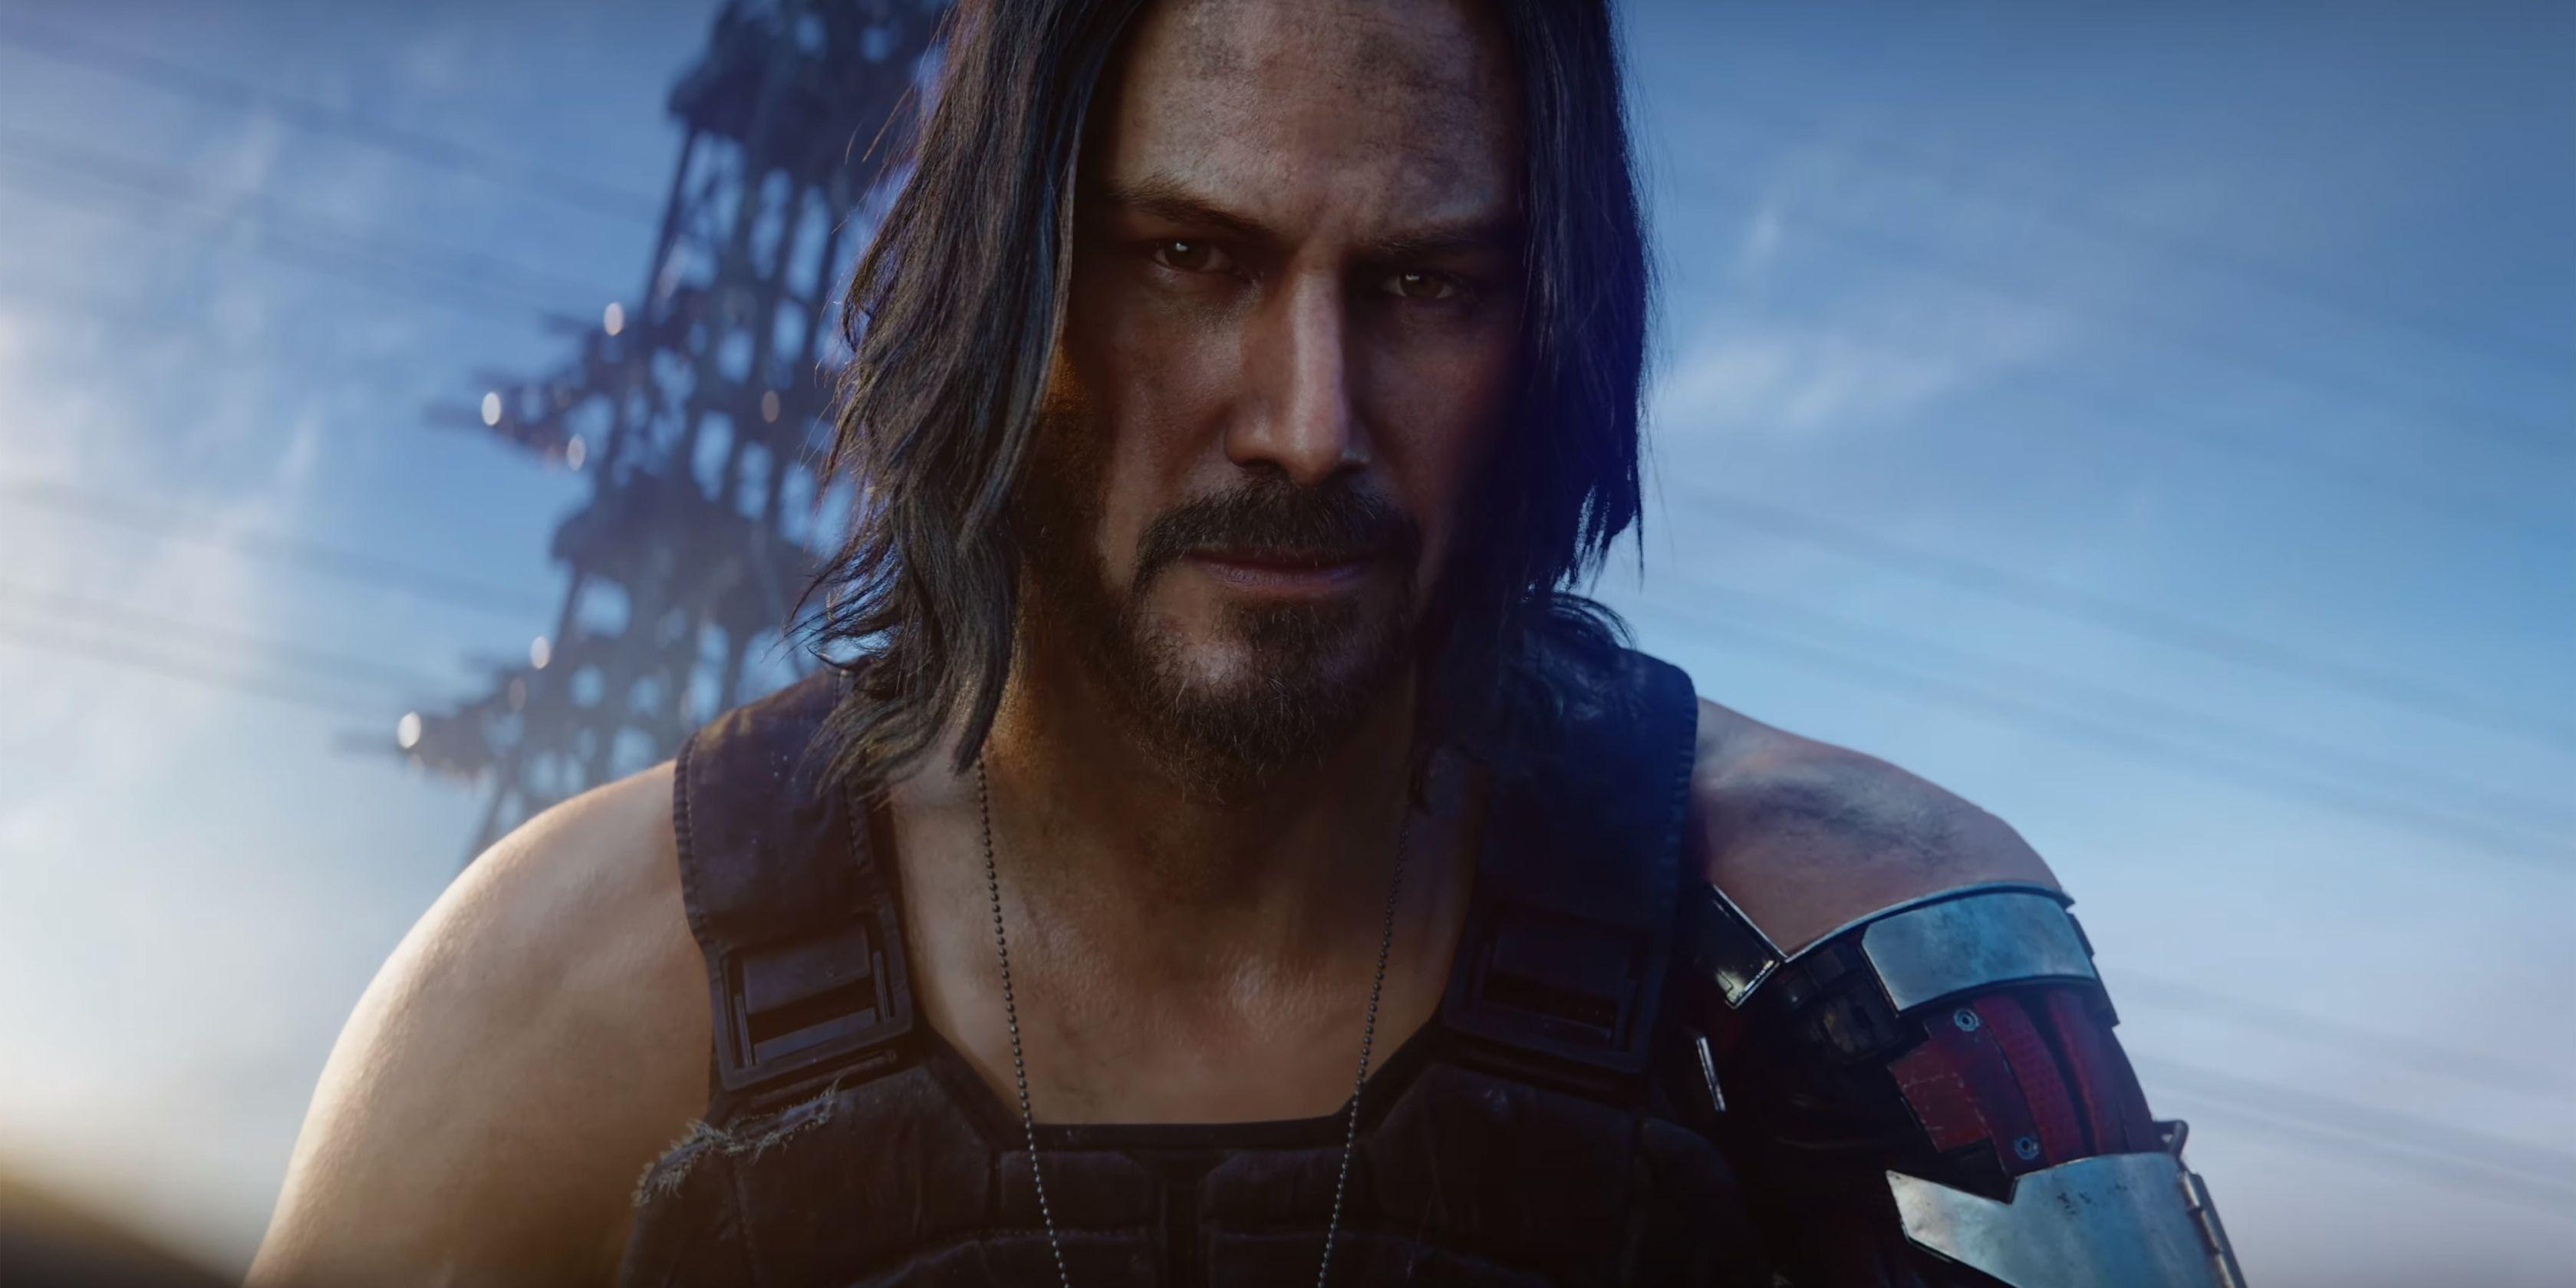 Sorry Keanu Reeves Fans, Cyberpunk 2077 Won't Let You Romance Him